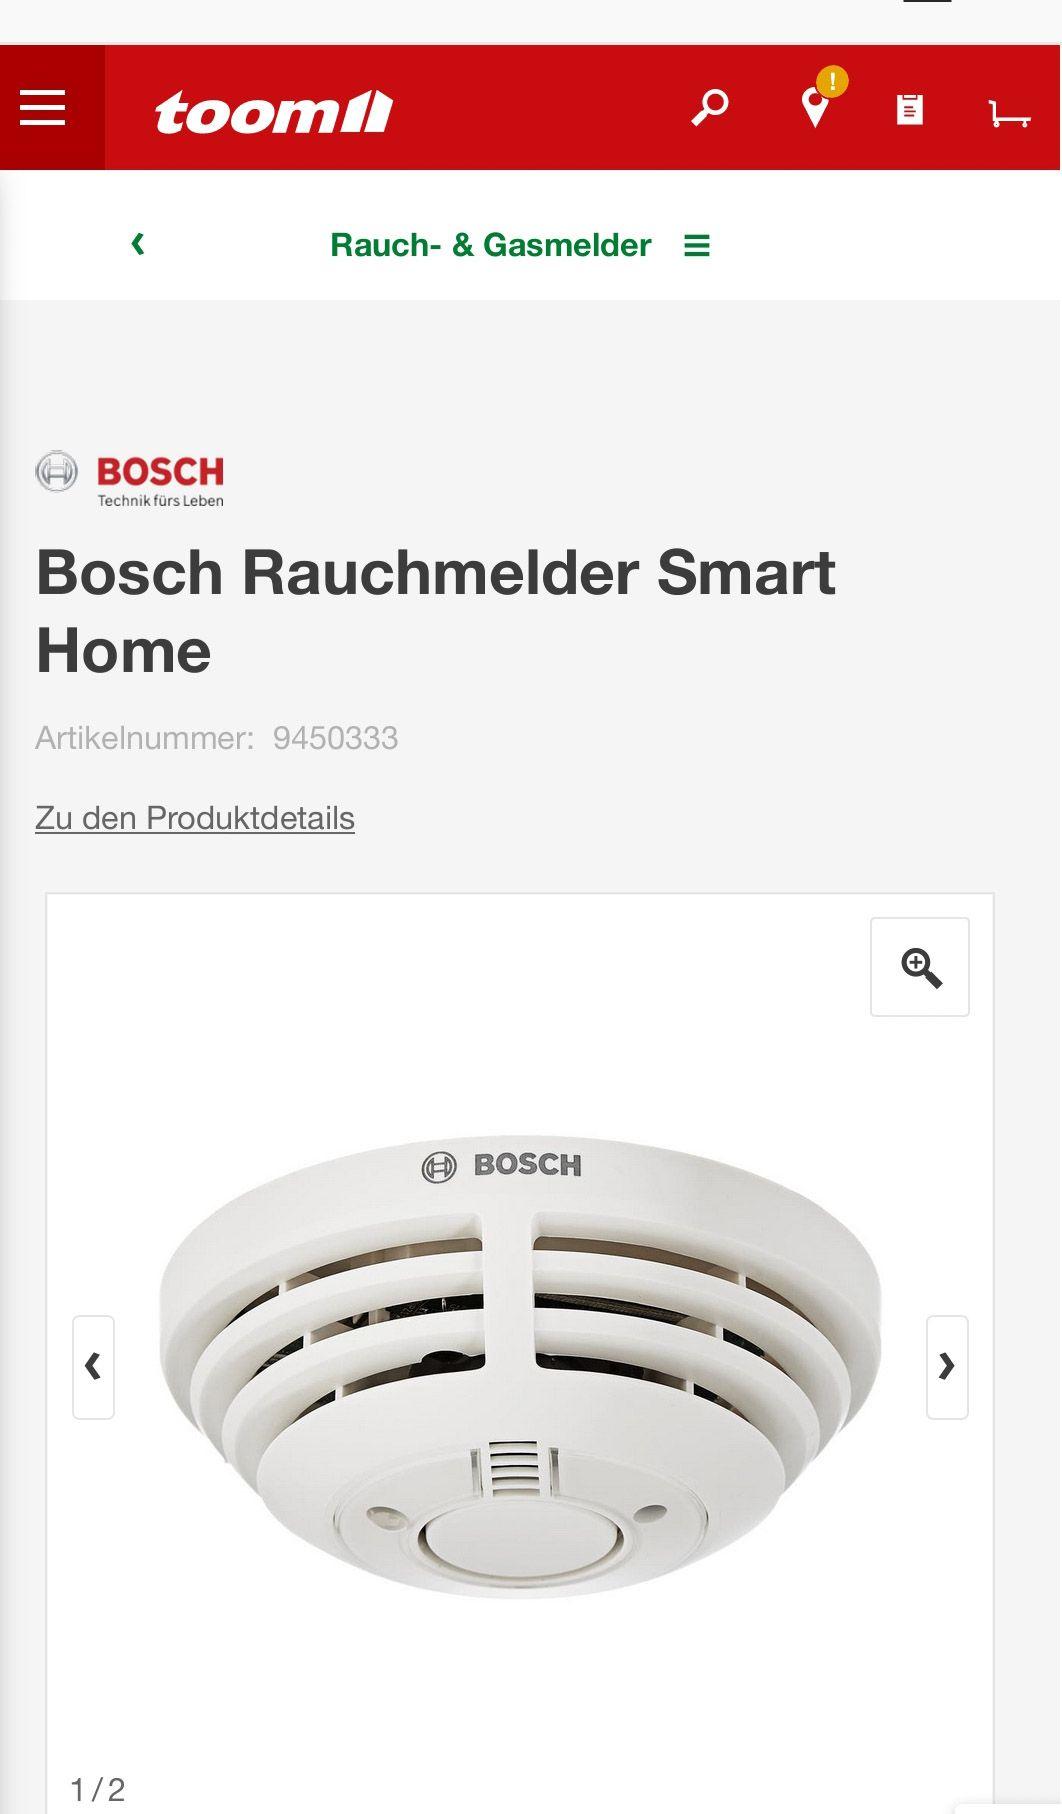 Smarter Bosch Rauchmelder (8750000017) + Bauhaus TPG